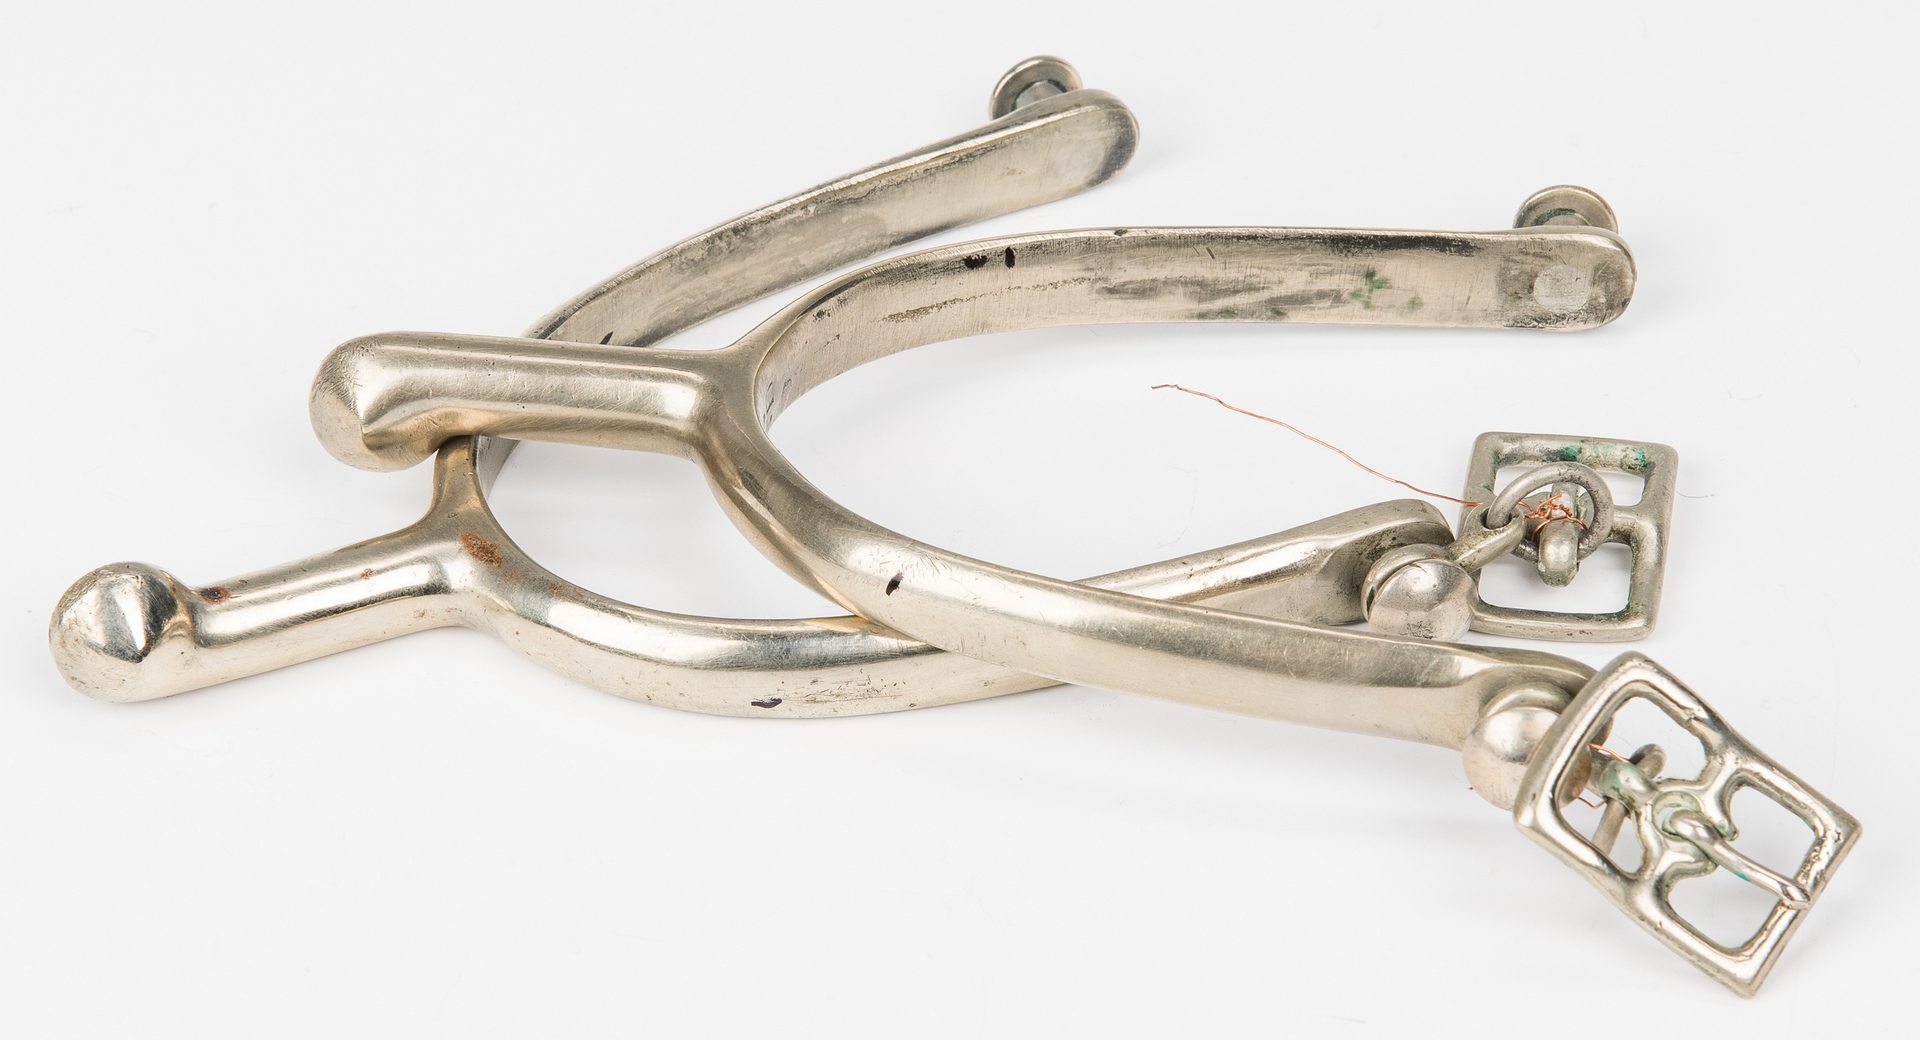 Lot 185: Scrimshaw, Bayonet, U.S. Model 1911 Cavalry Spurs, 3 items